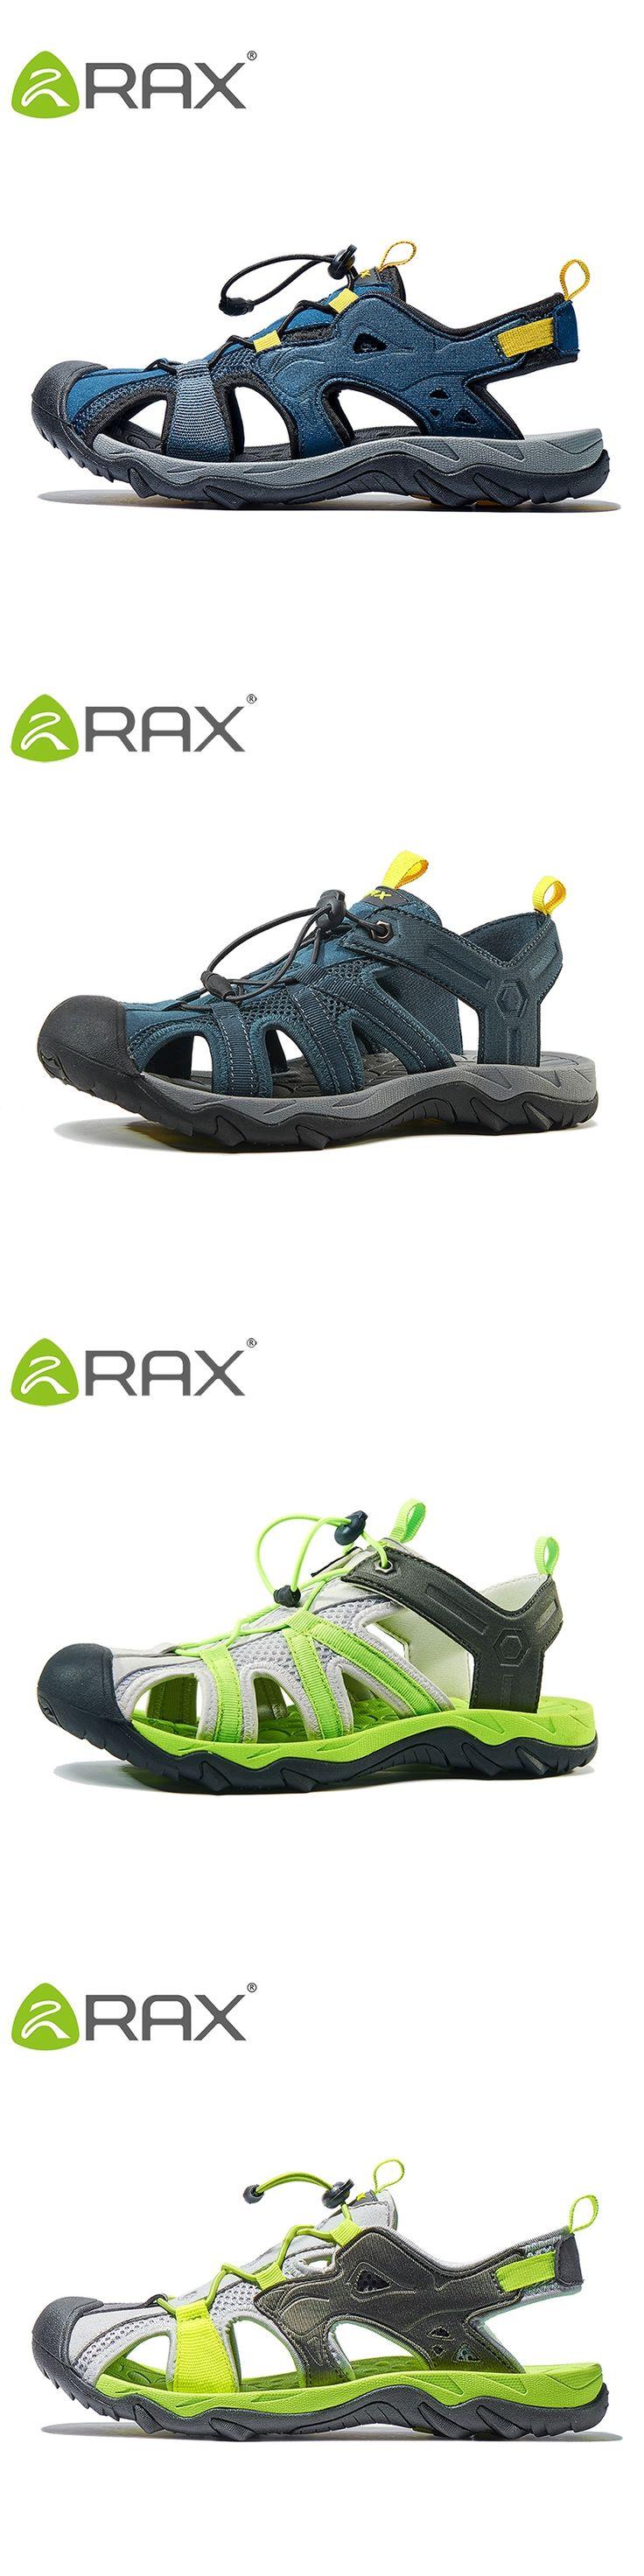 RAX Mens Sports Sandals Summer Outdoor Beach Sandals Men Aqua Trekking Water shoes For Men Upstream Shoes